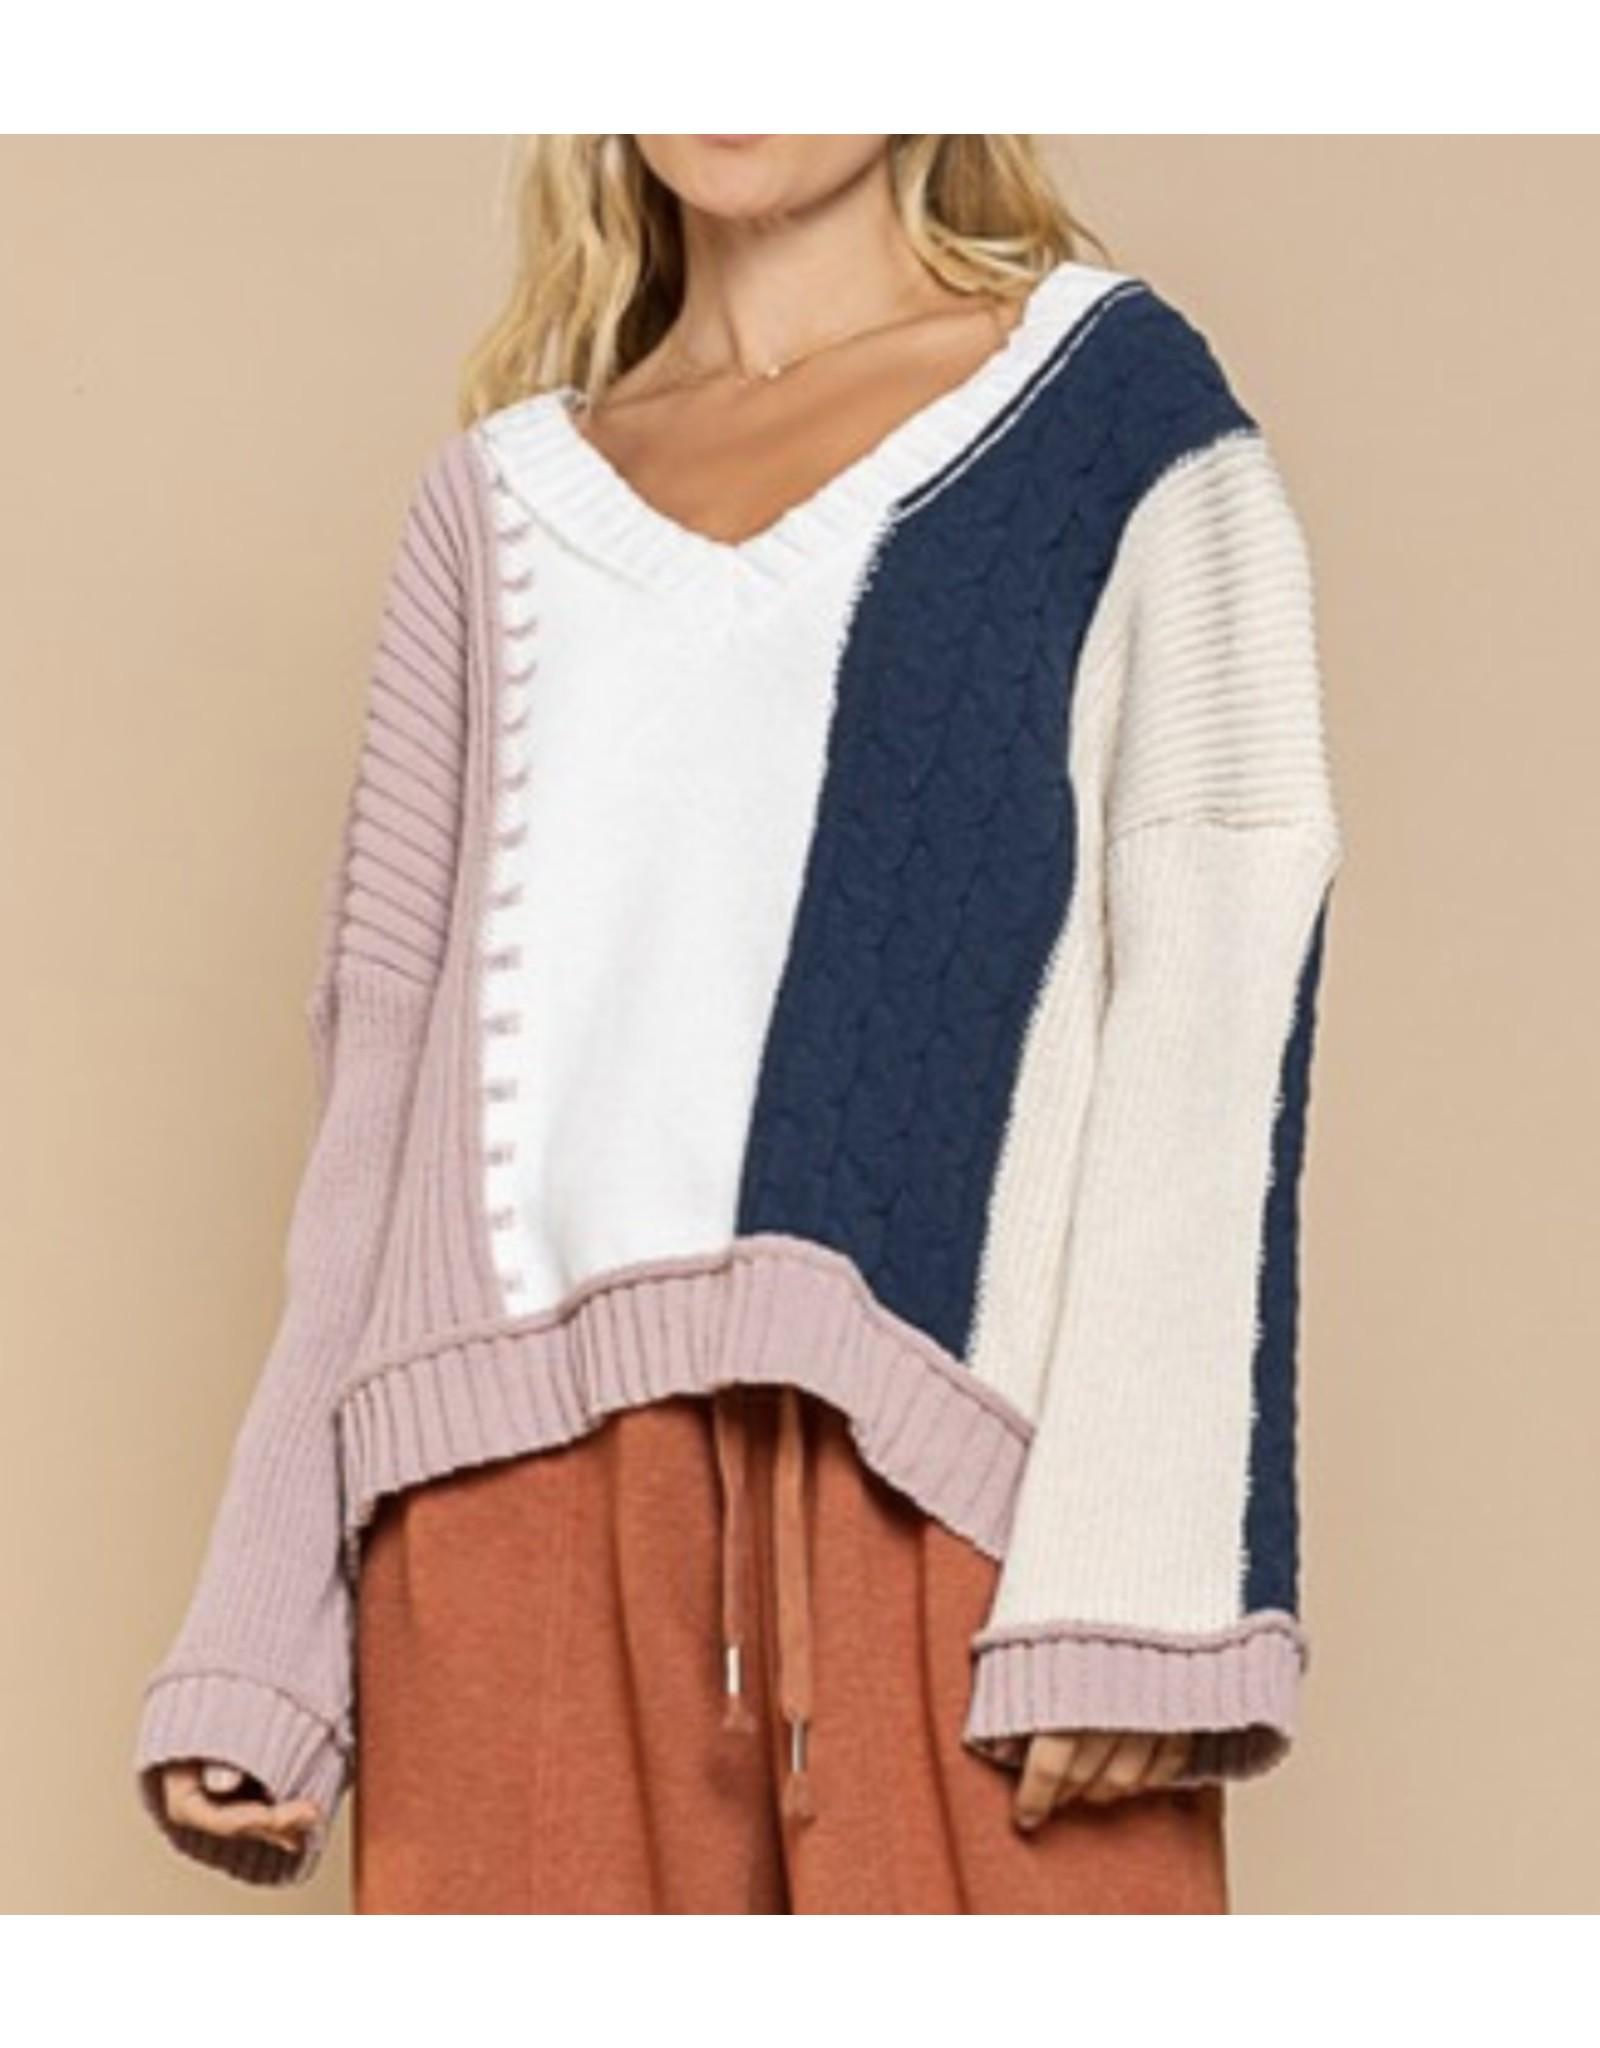 Color Block Hi/Low Sweater - Navy/Mauve